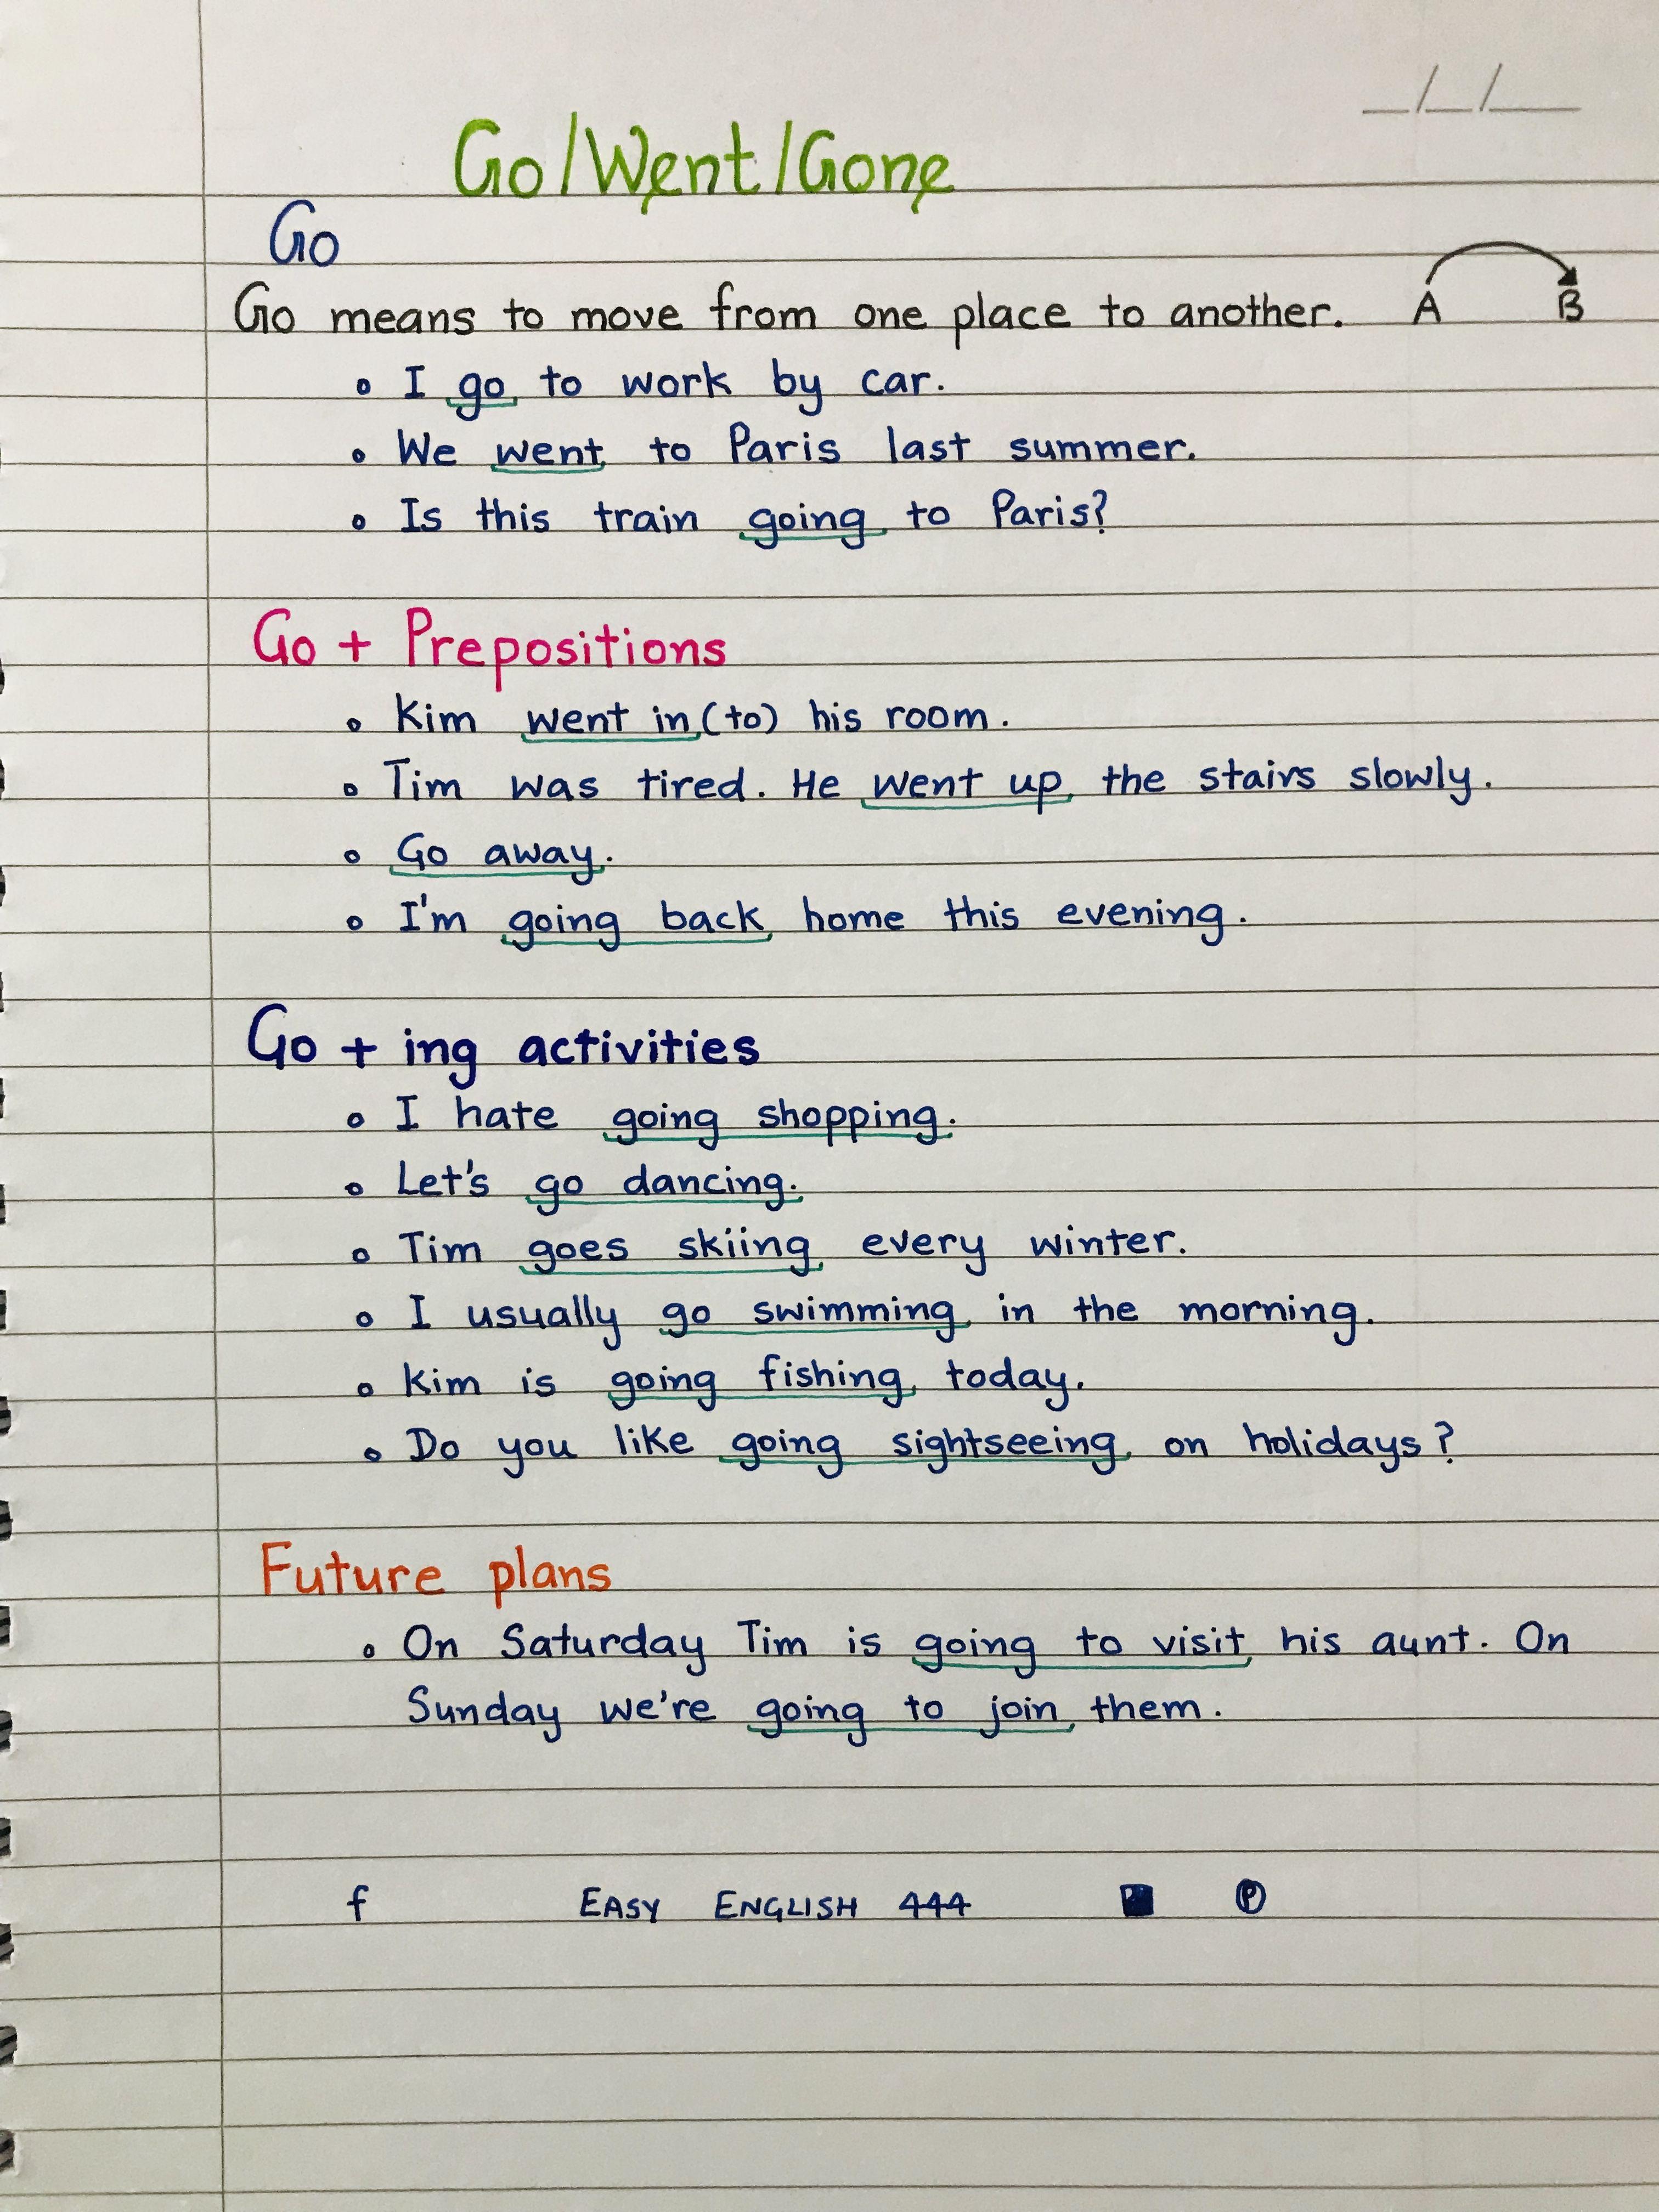 English Language Grammar Vocabulary Learning Language English Handwritten English Language Learning Grammar English Grammar Learn English Words [ 4032 x 3024 Pixel ]